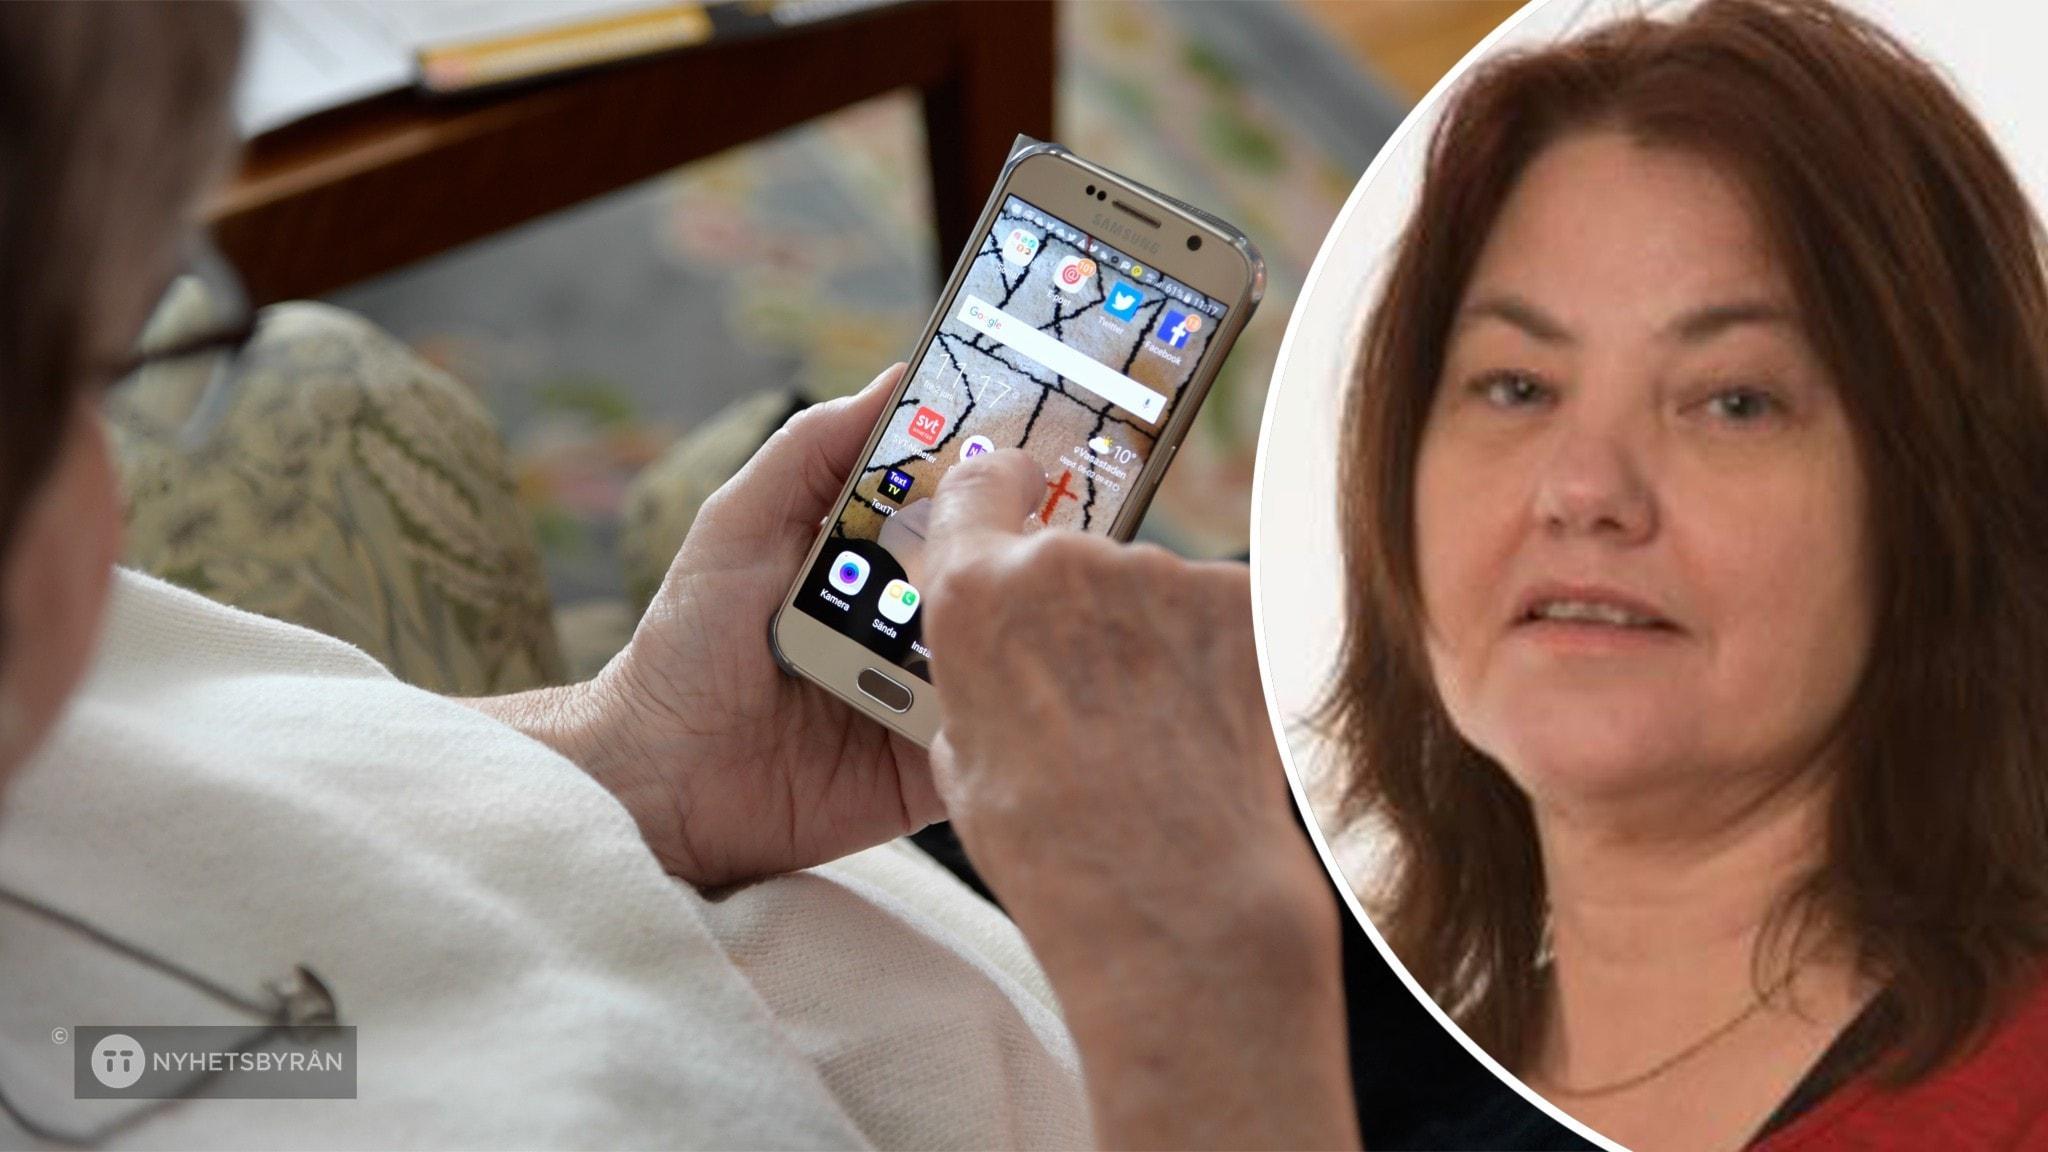 På det stora fotot syns en äldre kvinna som håller på med sin mobiltelefon. På det lilla fotot syns Linda Reneland-Forsman. Hon har brunt hår.